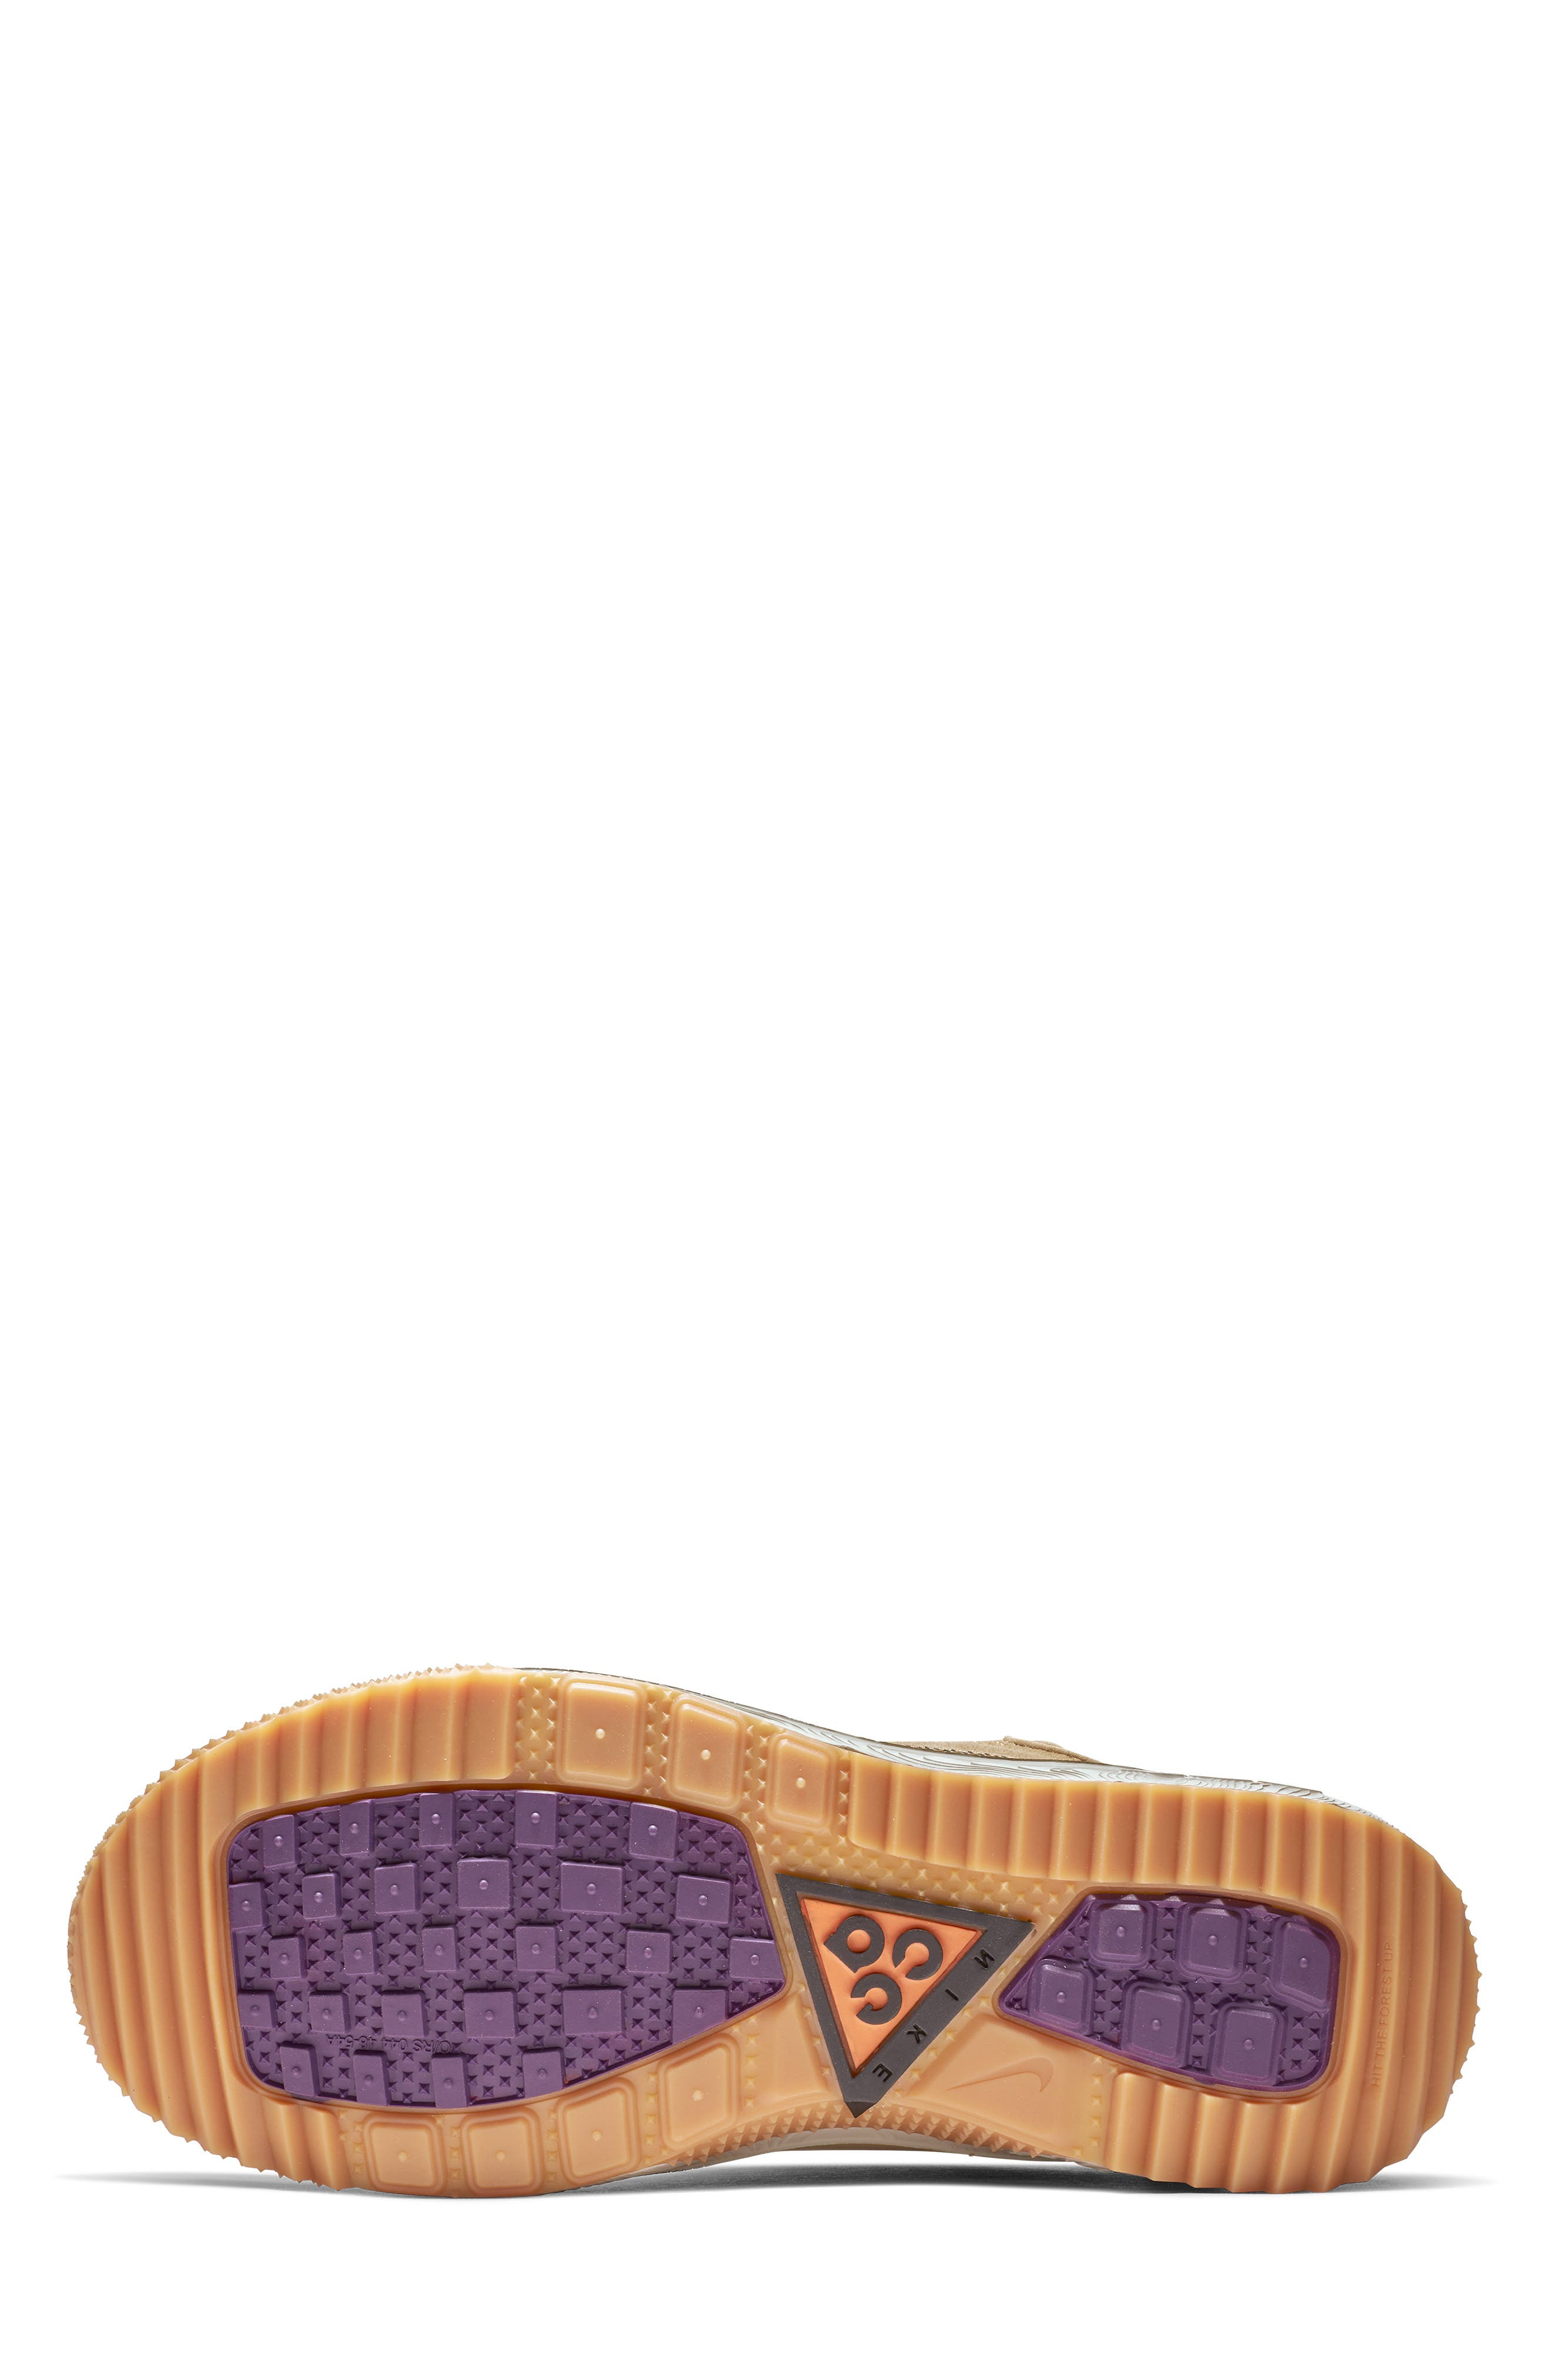 ACG Angels Rest Sneaker,                             Alternate thumbnail 5, color,                             PARACHUTE BEIGE/ YUKON BROWN